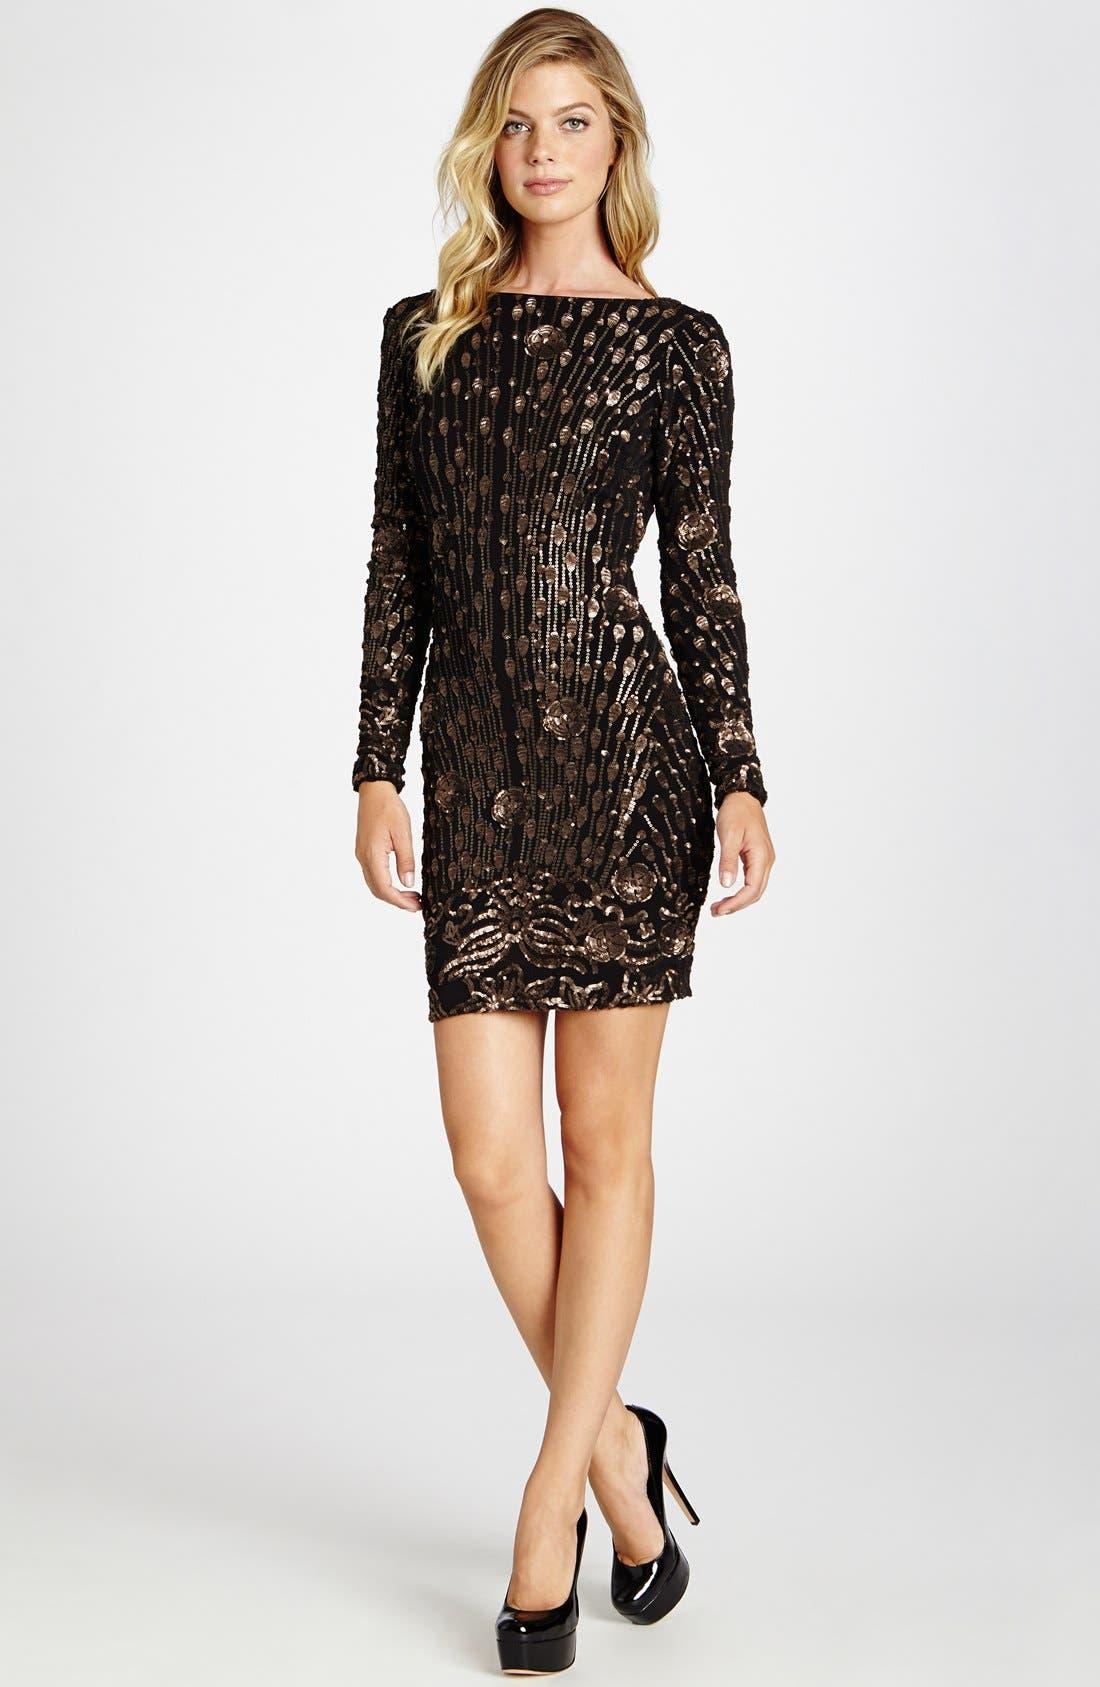 DRESS THE POPULATION 'Lola' Sequin Minidress, Main, color, 714